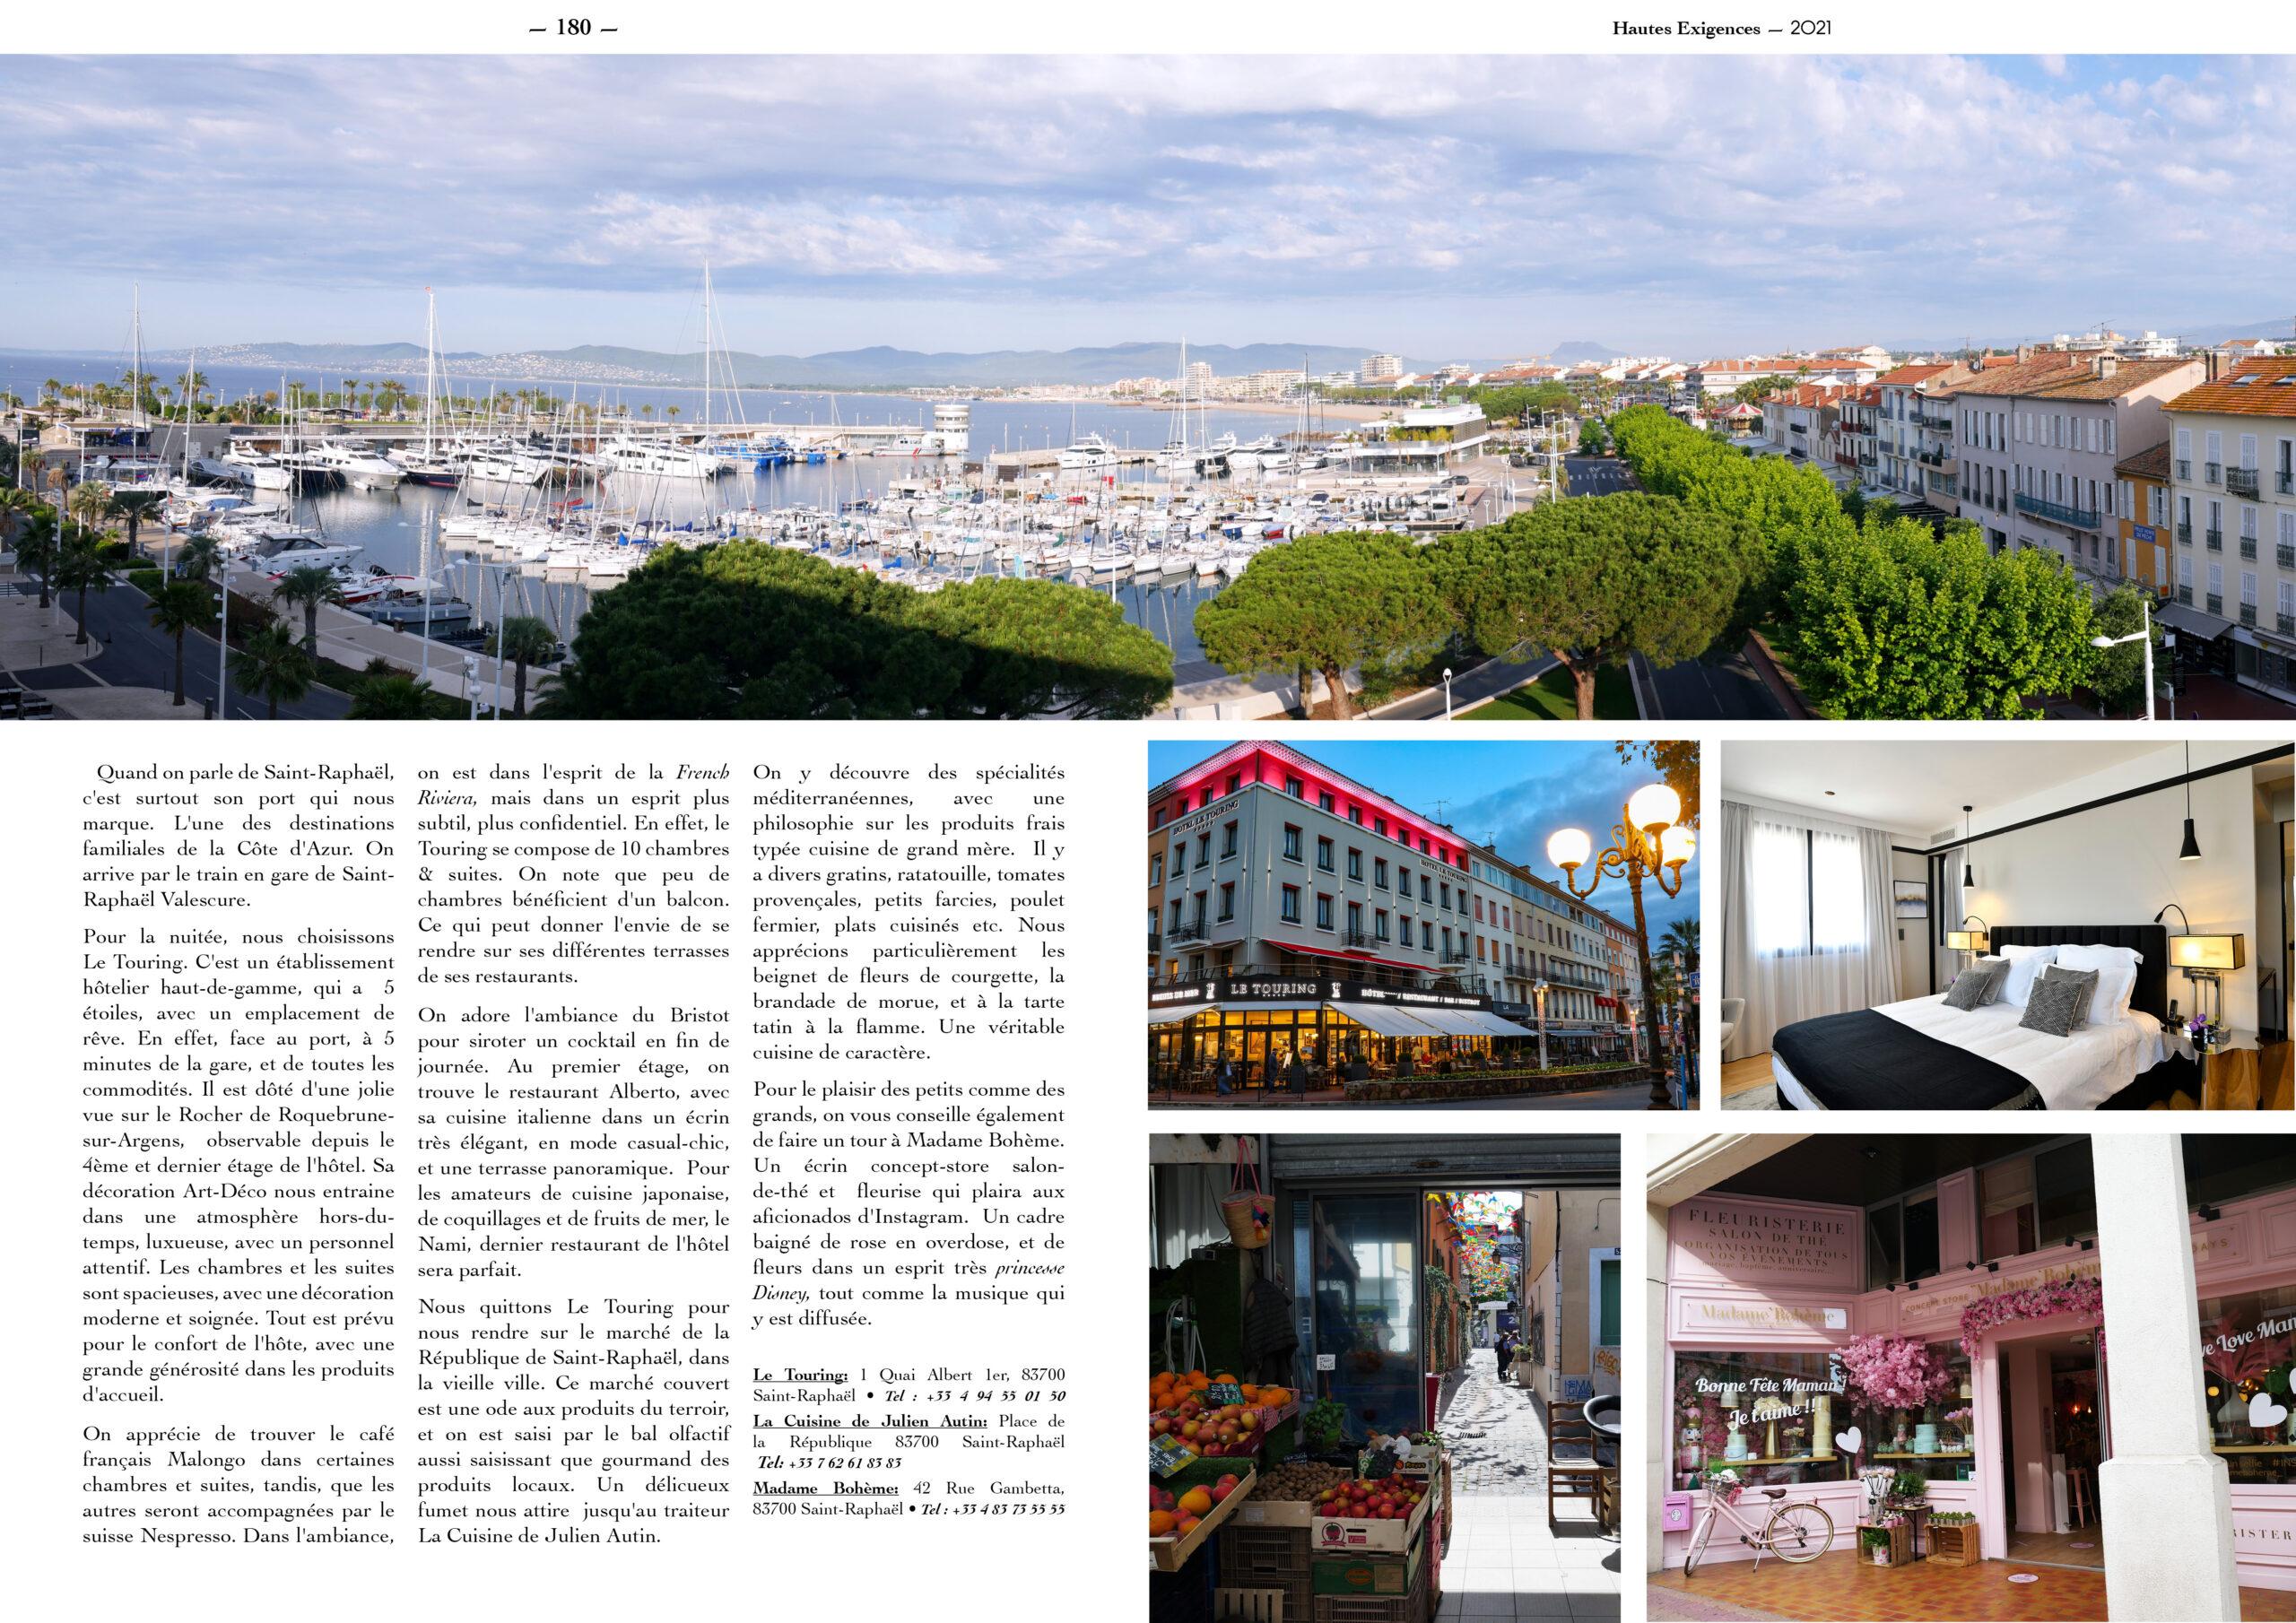 Hautes Exigences Magazine Hors Serie 2021 page 178-179